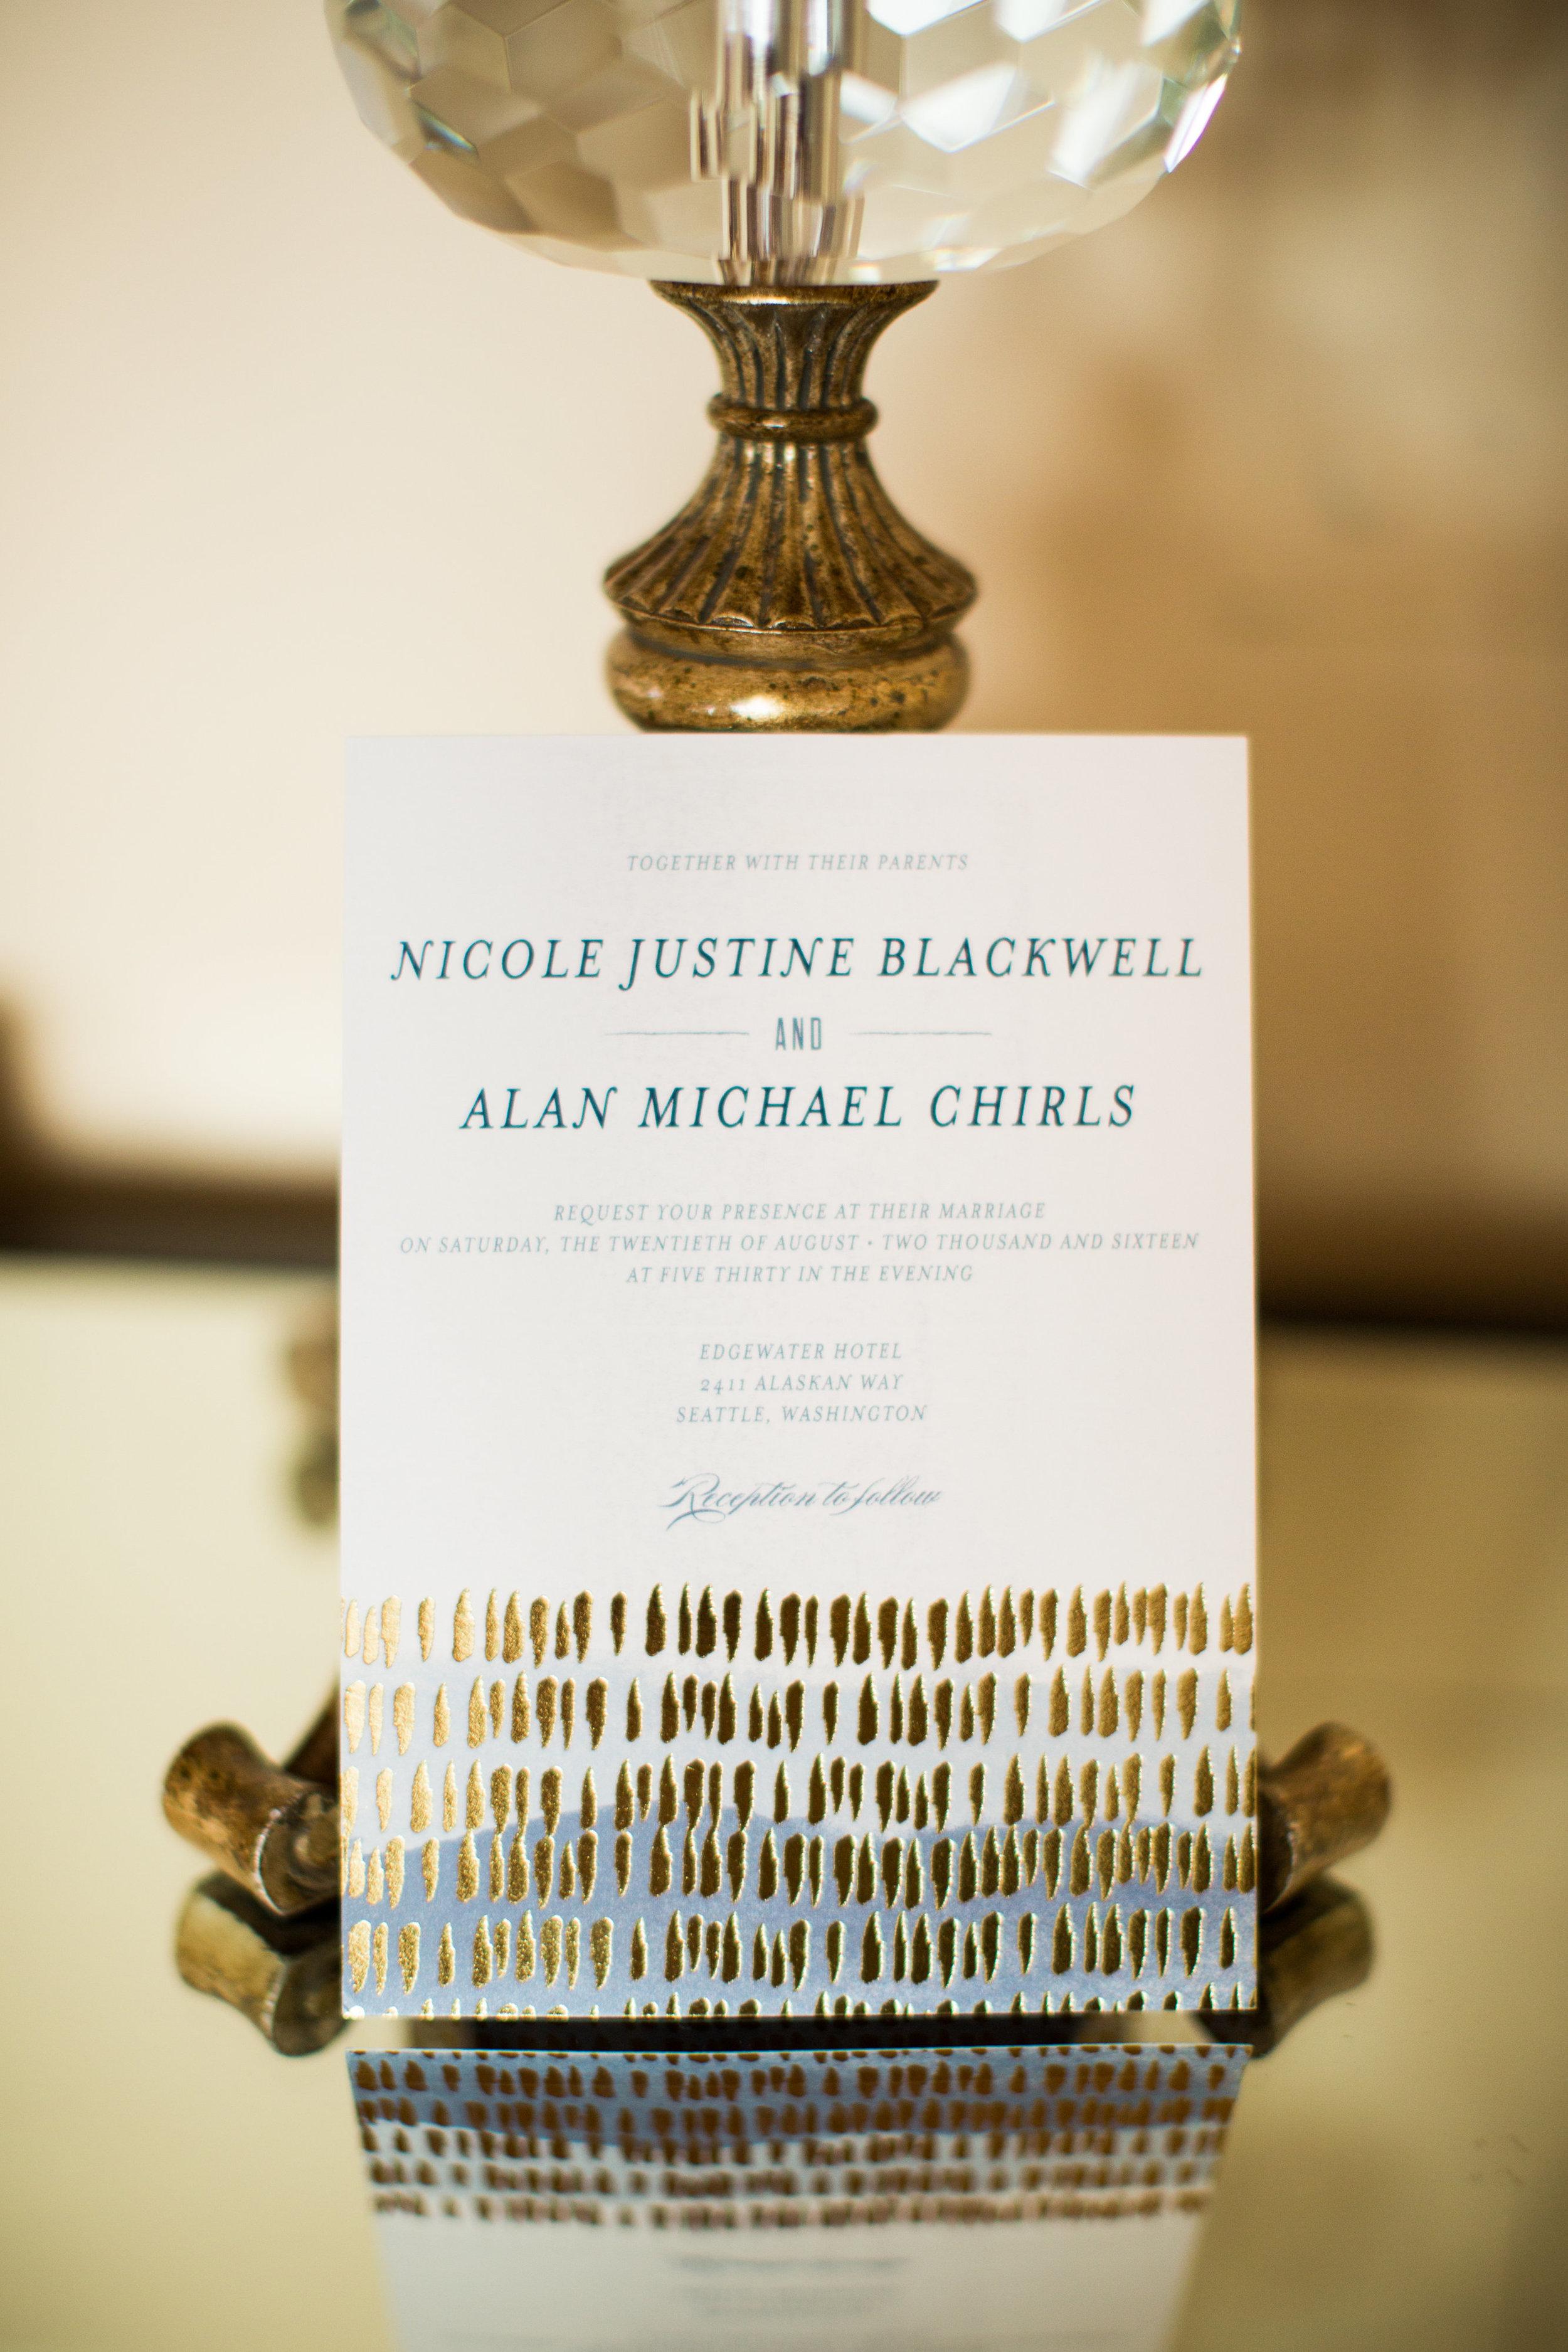 Seattle Wedding Planner, Wedding Wise | Ciccarelli Photography | Edgewater Hotel Wedding | Navy and Gold Wedding Invitation